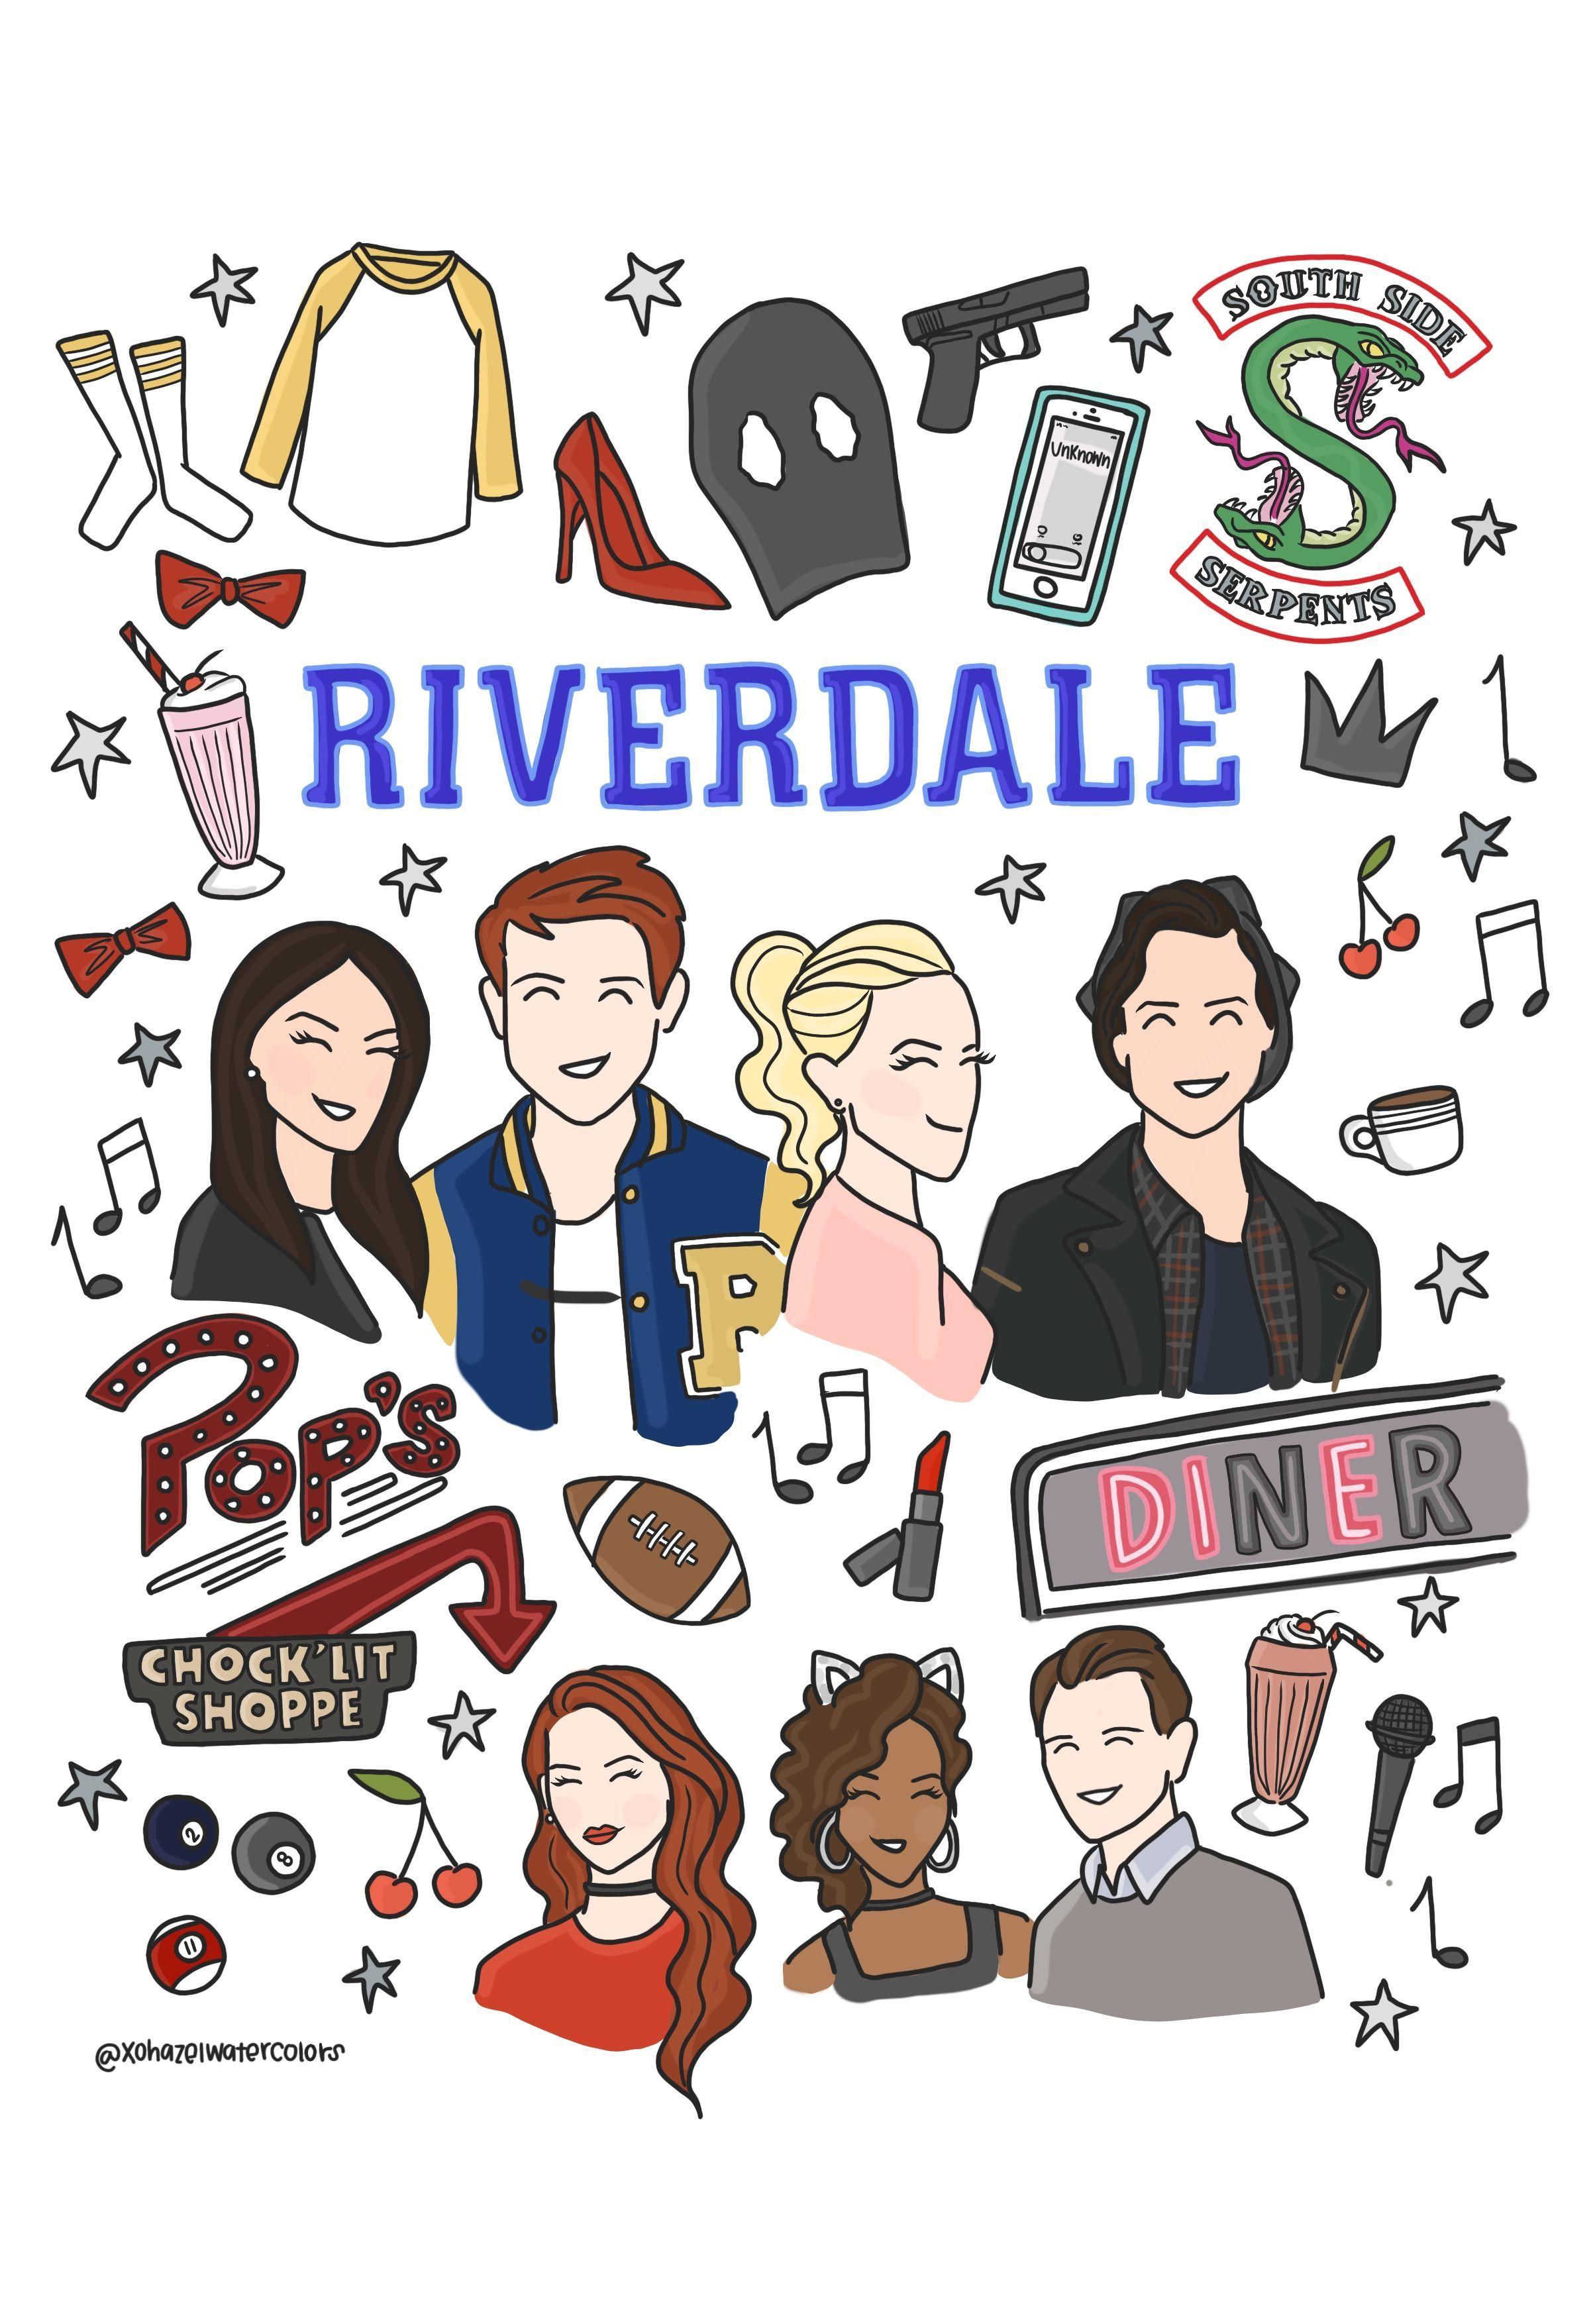 Download Free png Riverdale clipart 5 » Clipart Portal.